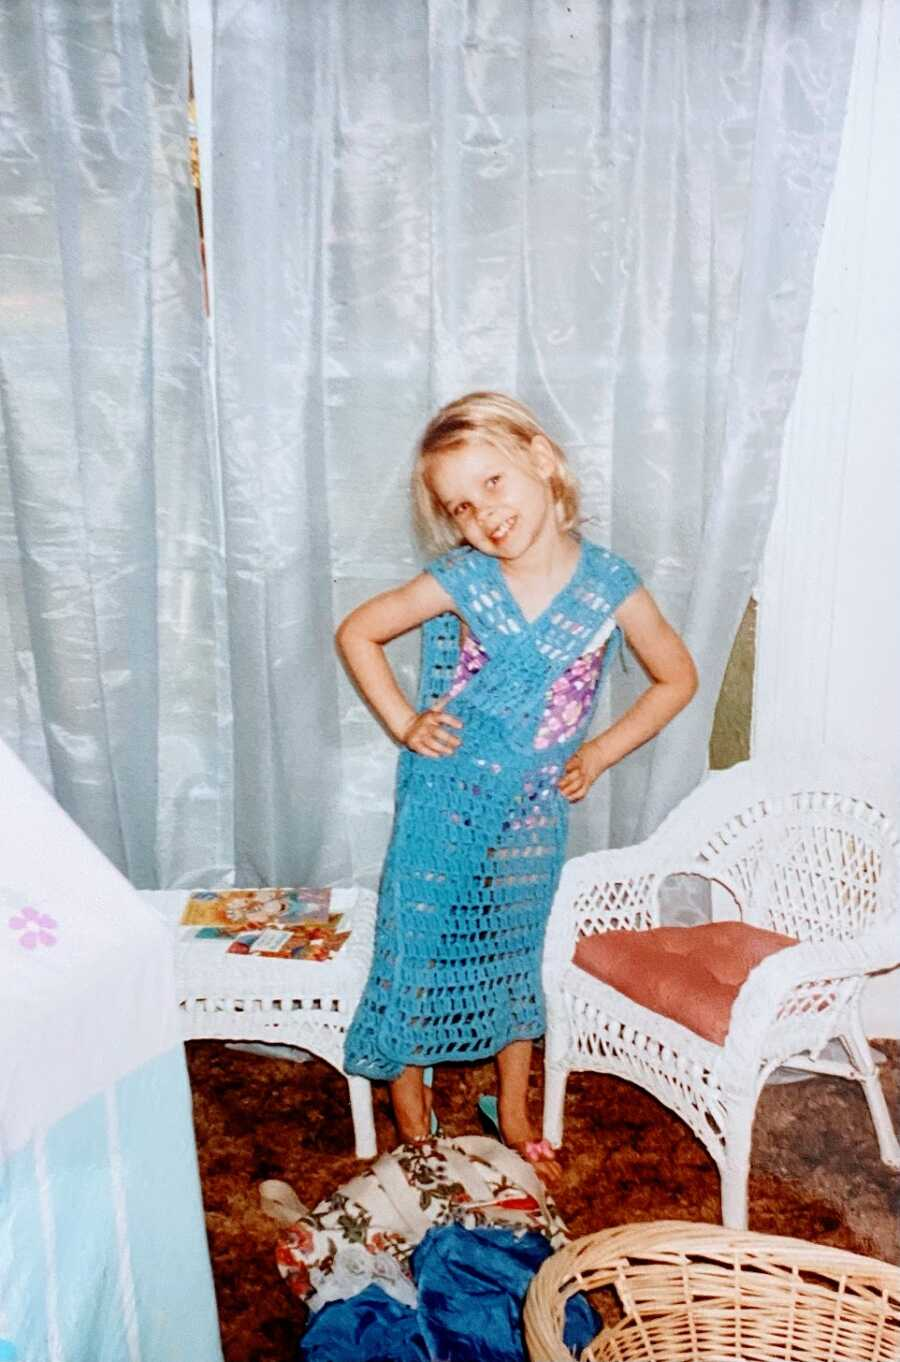 Young girl wearing blue dress